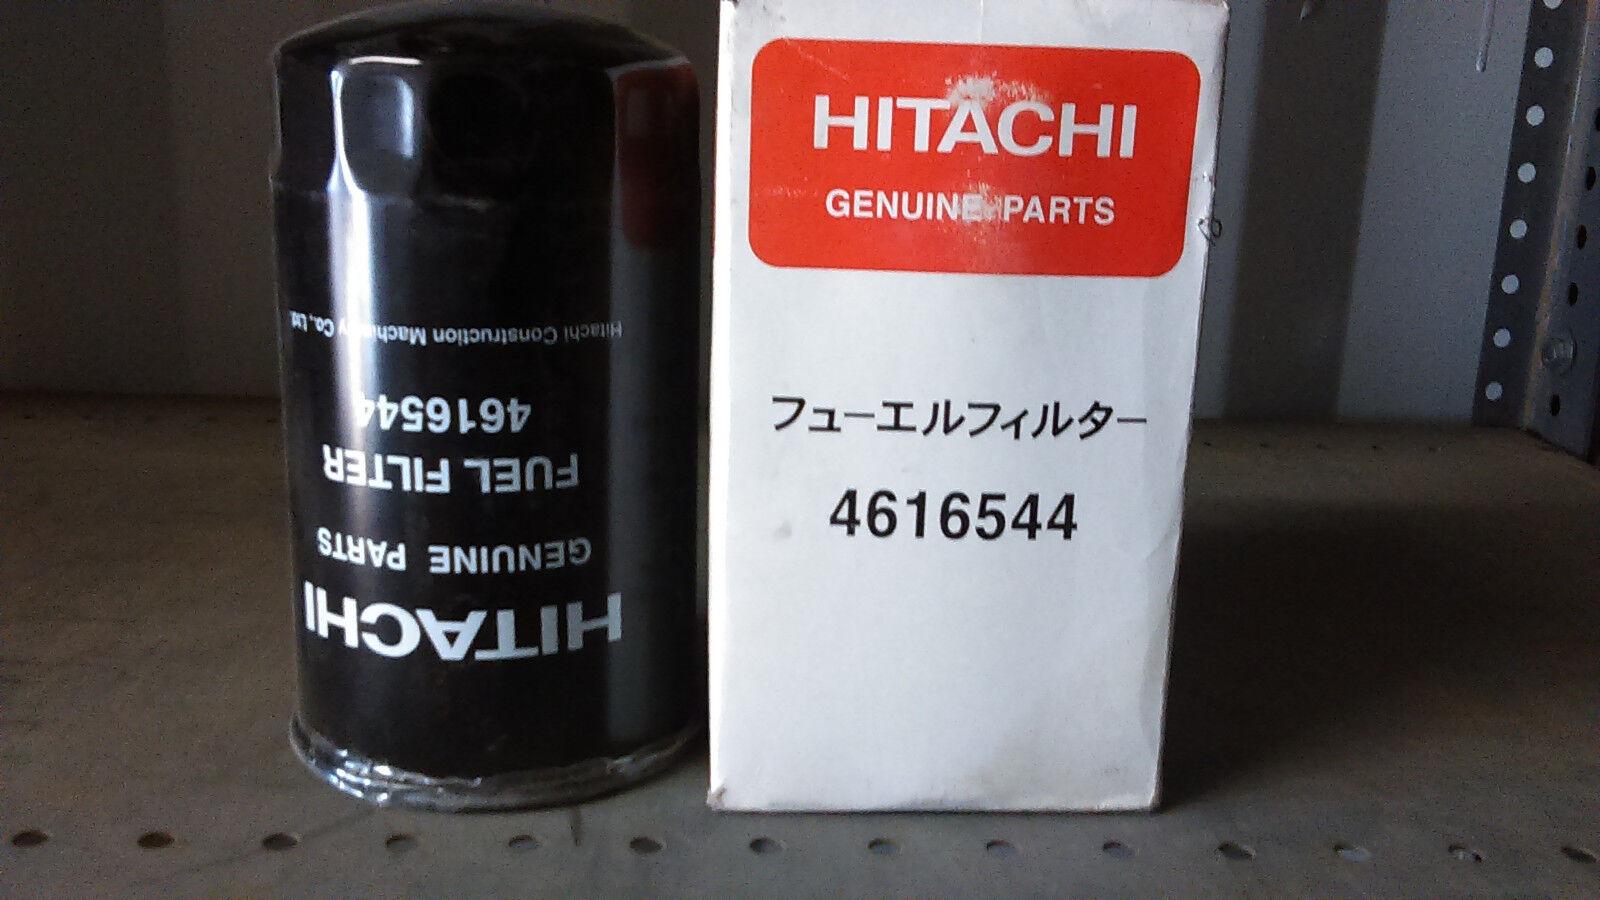 Na Fuel Filter Hitachi 4616544 Ebay Caterpillar Housing Norton Secured Powered By Verisign